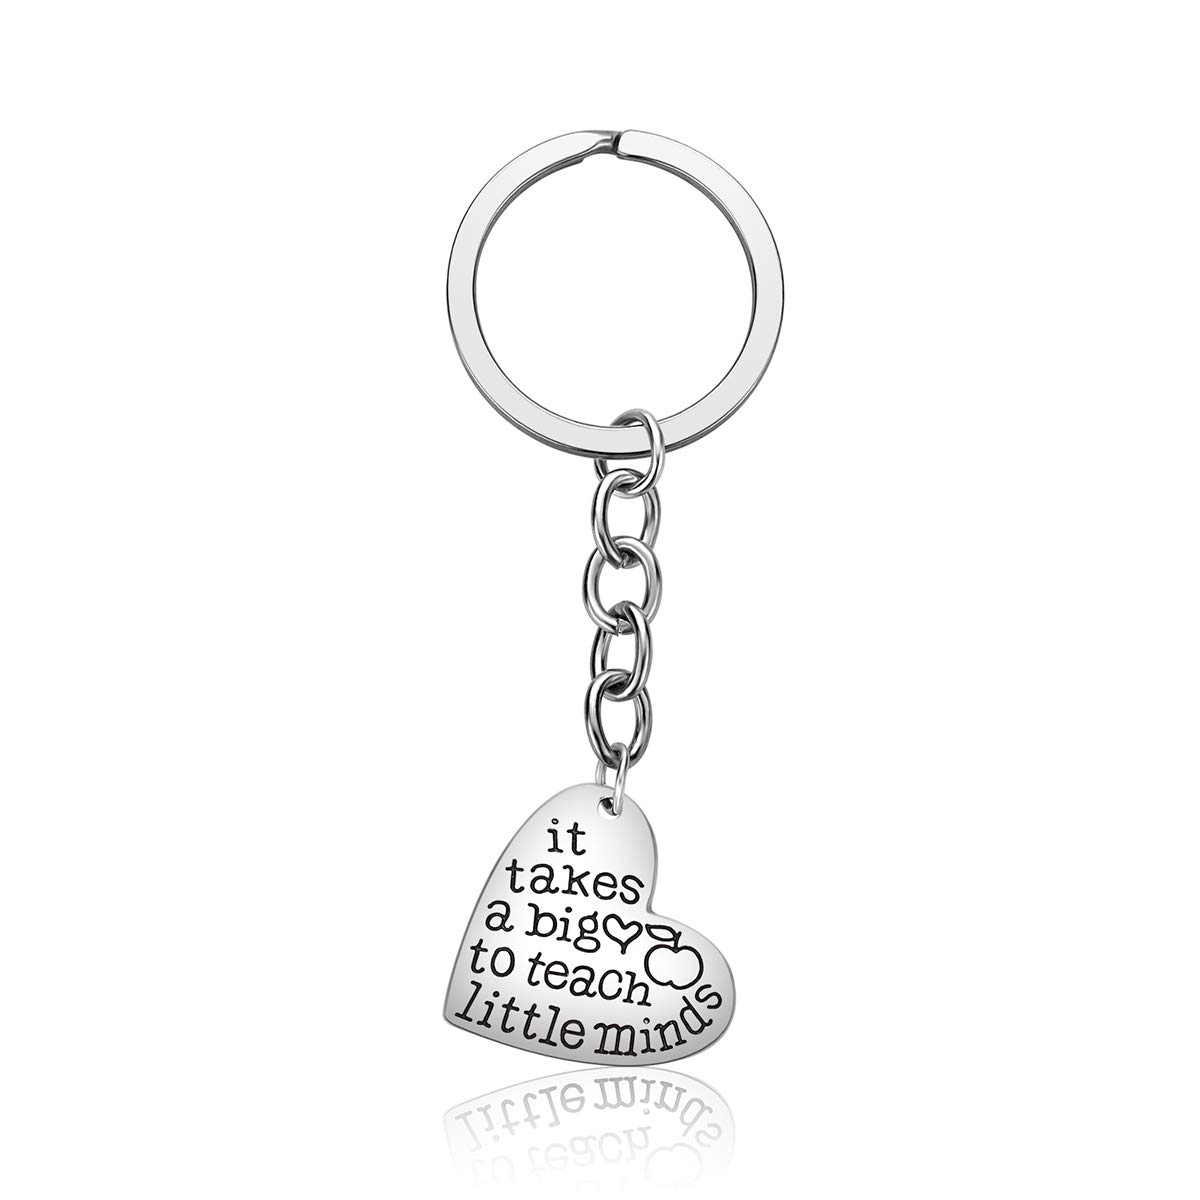 Teacher Appreciation Gifts for Women Thank You Gift Graduation Gift for Teachers 3PCS Heart Pendant Keychain Jewelry Set